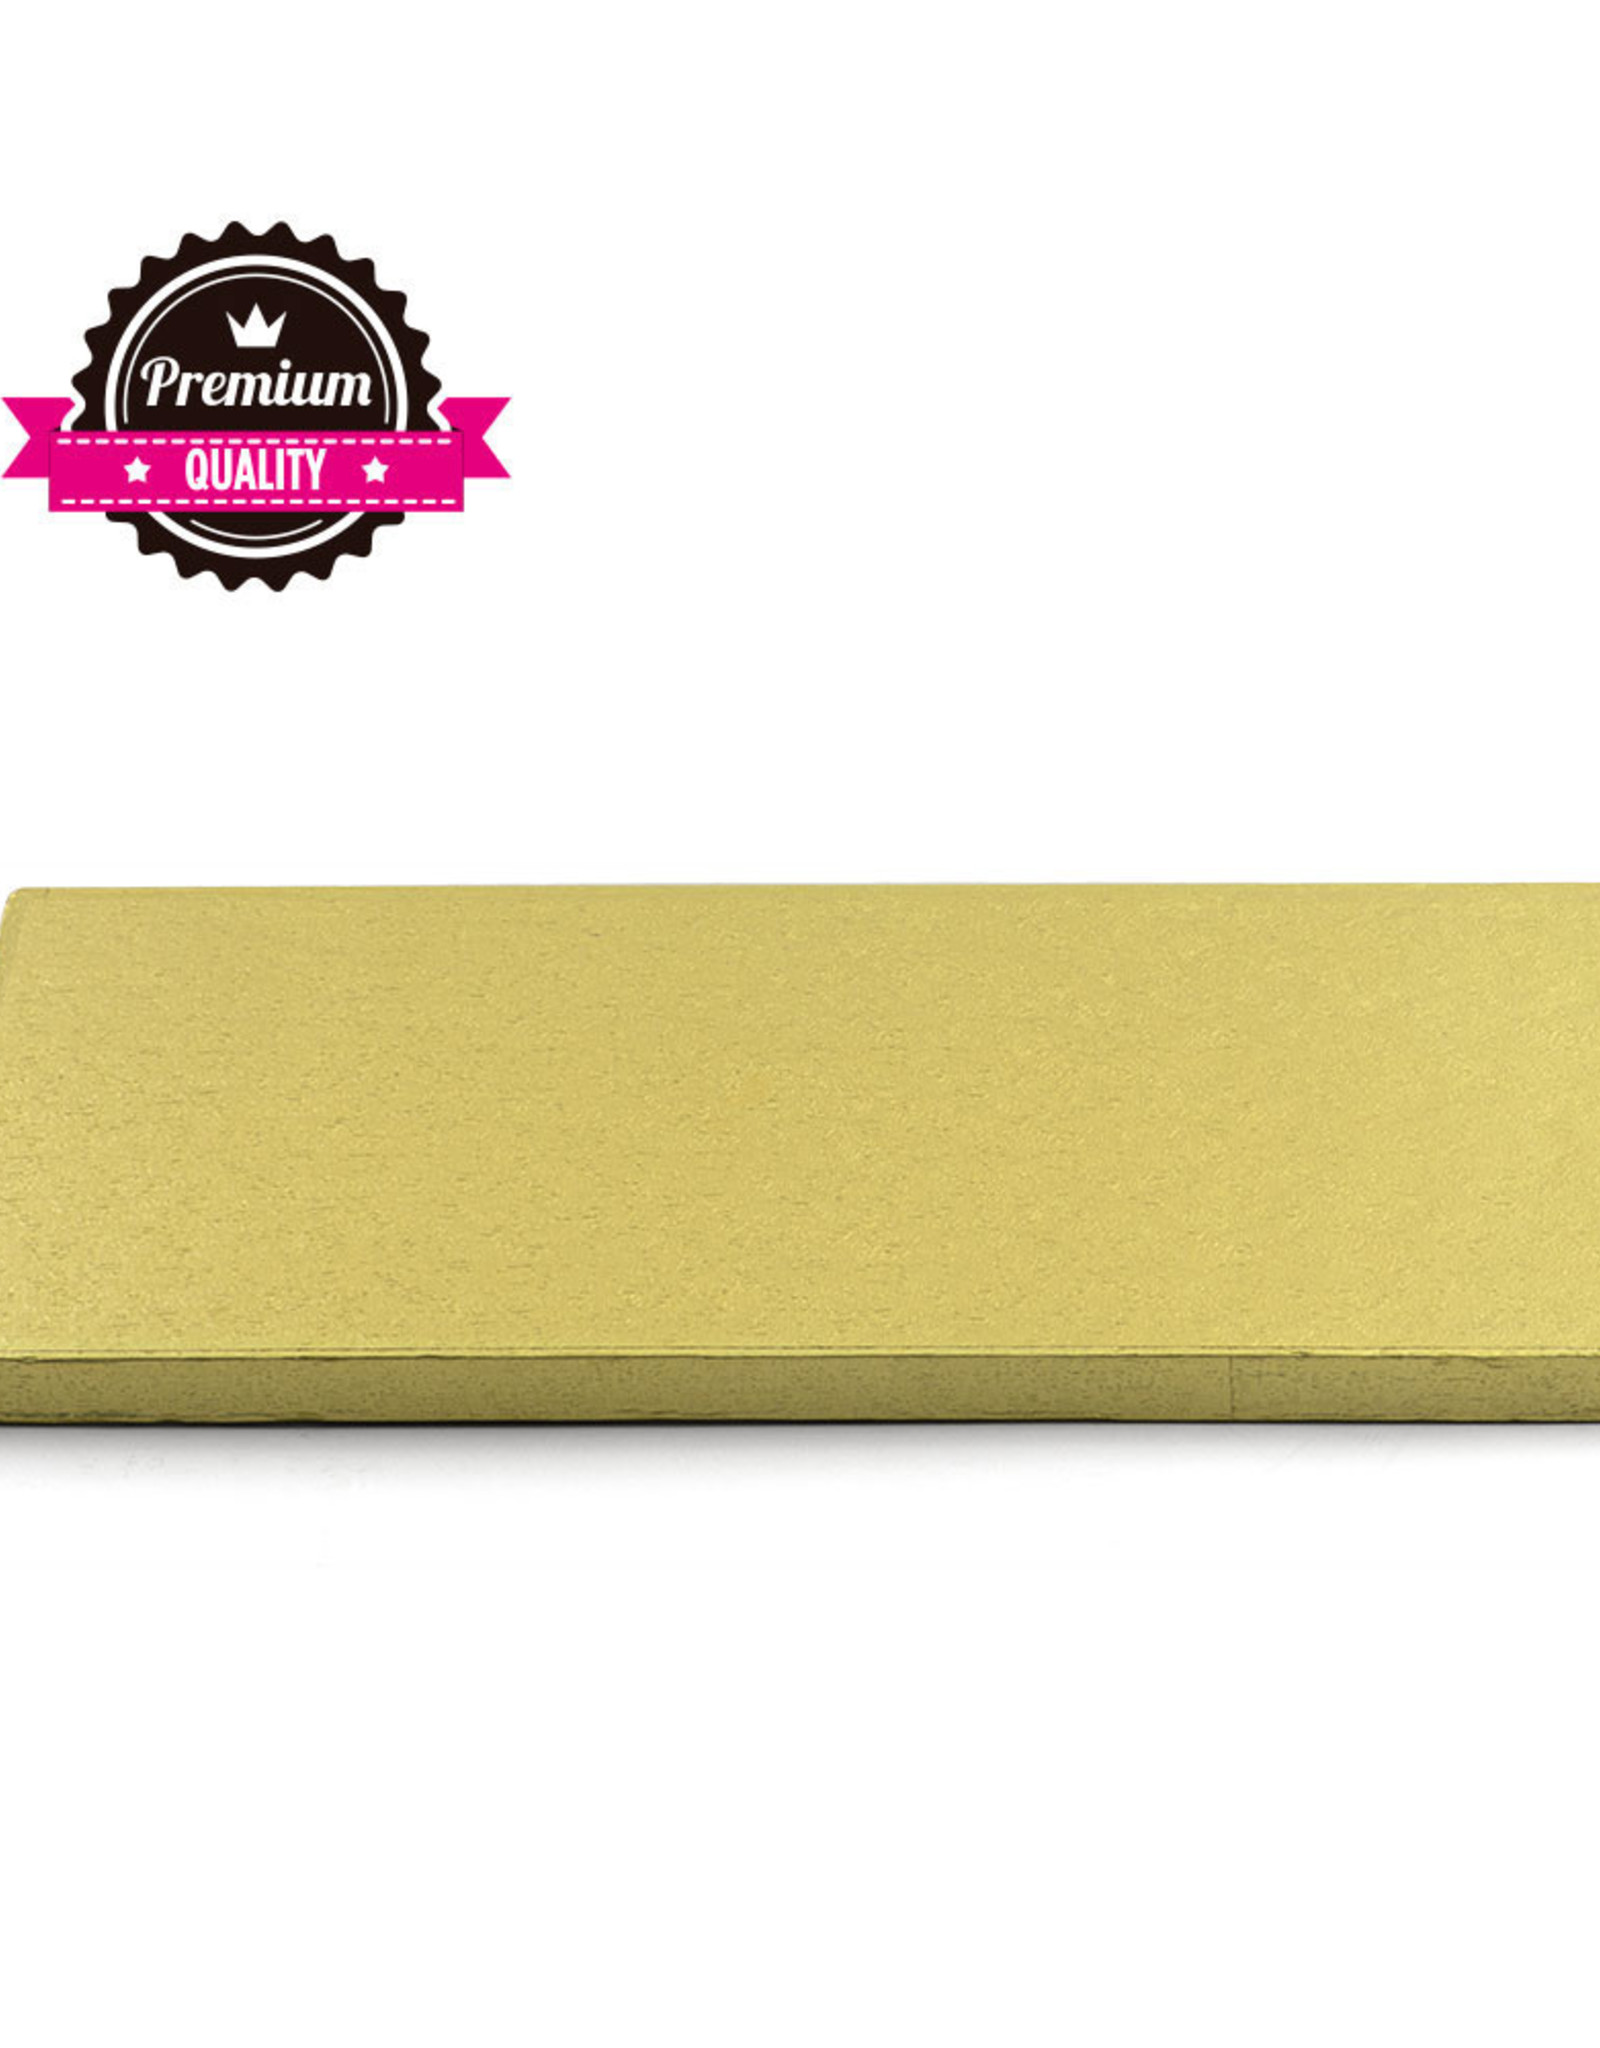 Cake Drum Rechthoek 60x40cm Gold